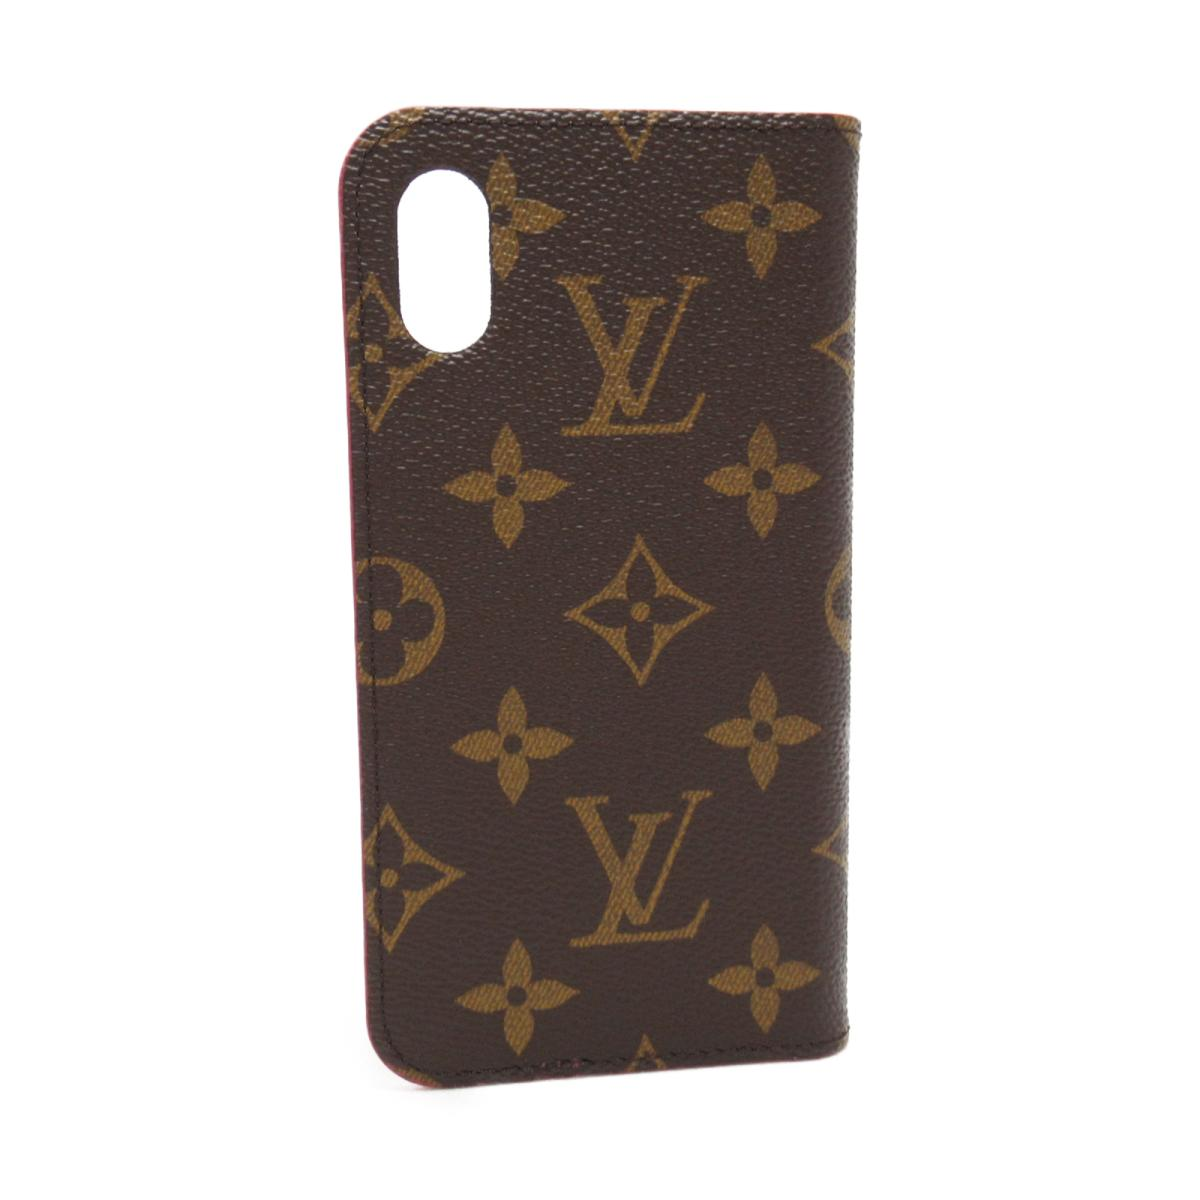 the latest 810bc b7e63 Louis Vuitton IPHONE X&XS, folio iPhone case wallet men gap Dis monogram  Rose (M63444) | LOUIS VUITTON BRANDOFF brand off Vuitton Vuitton Louis ...